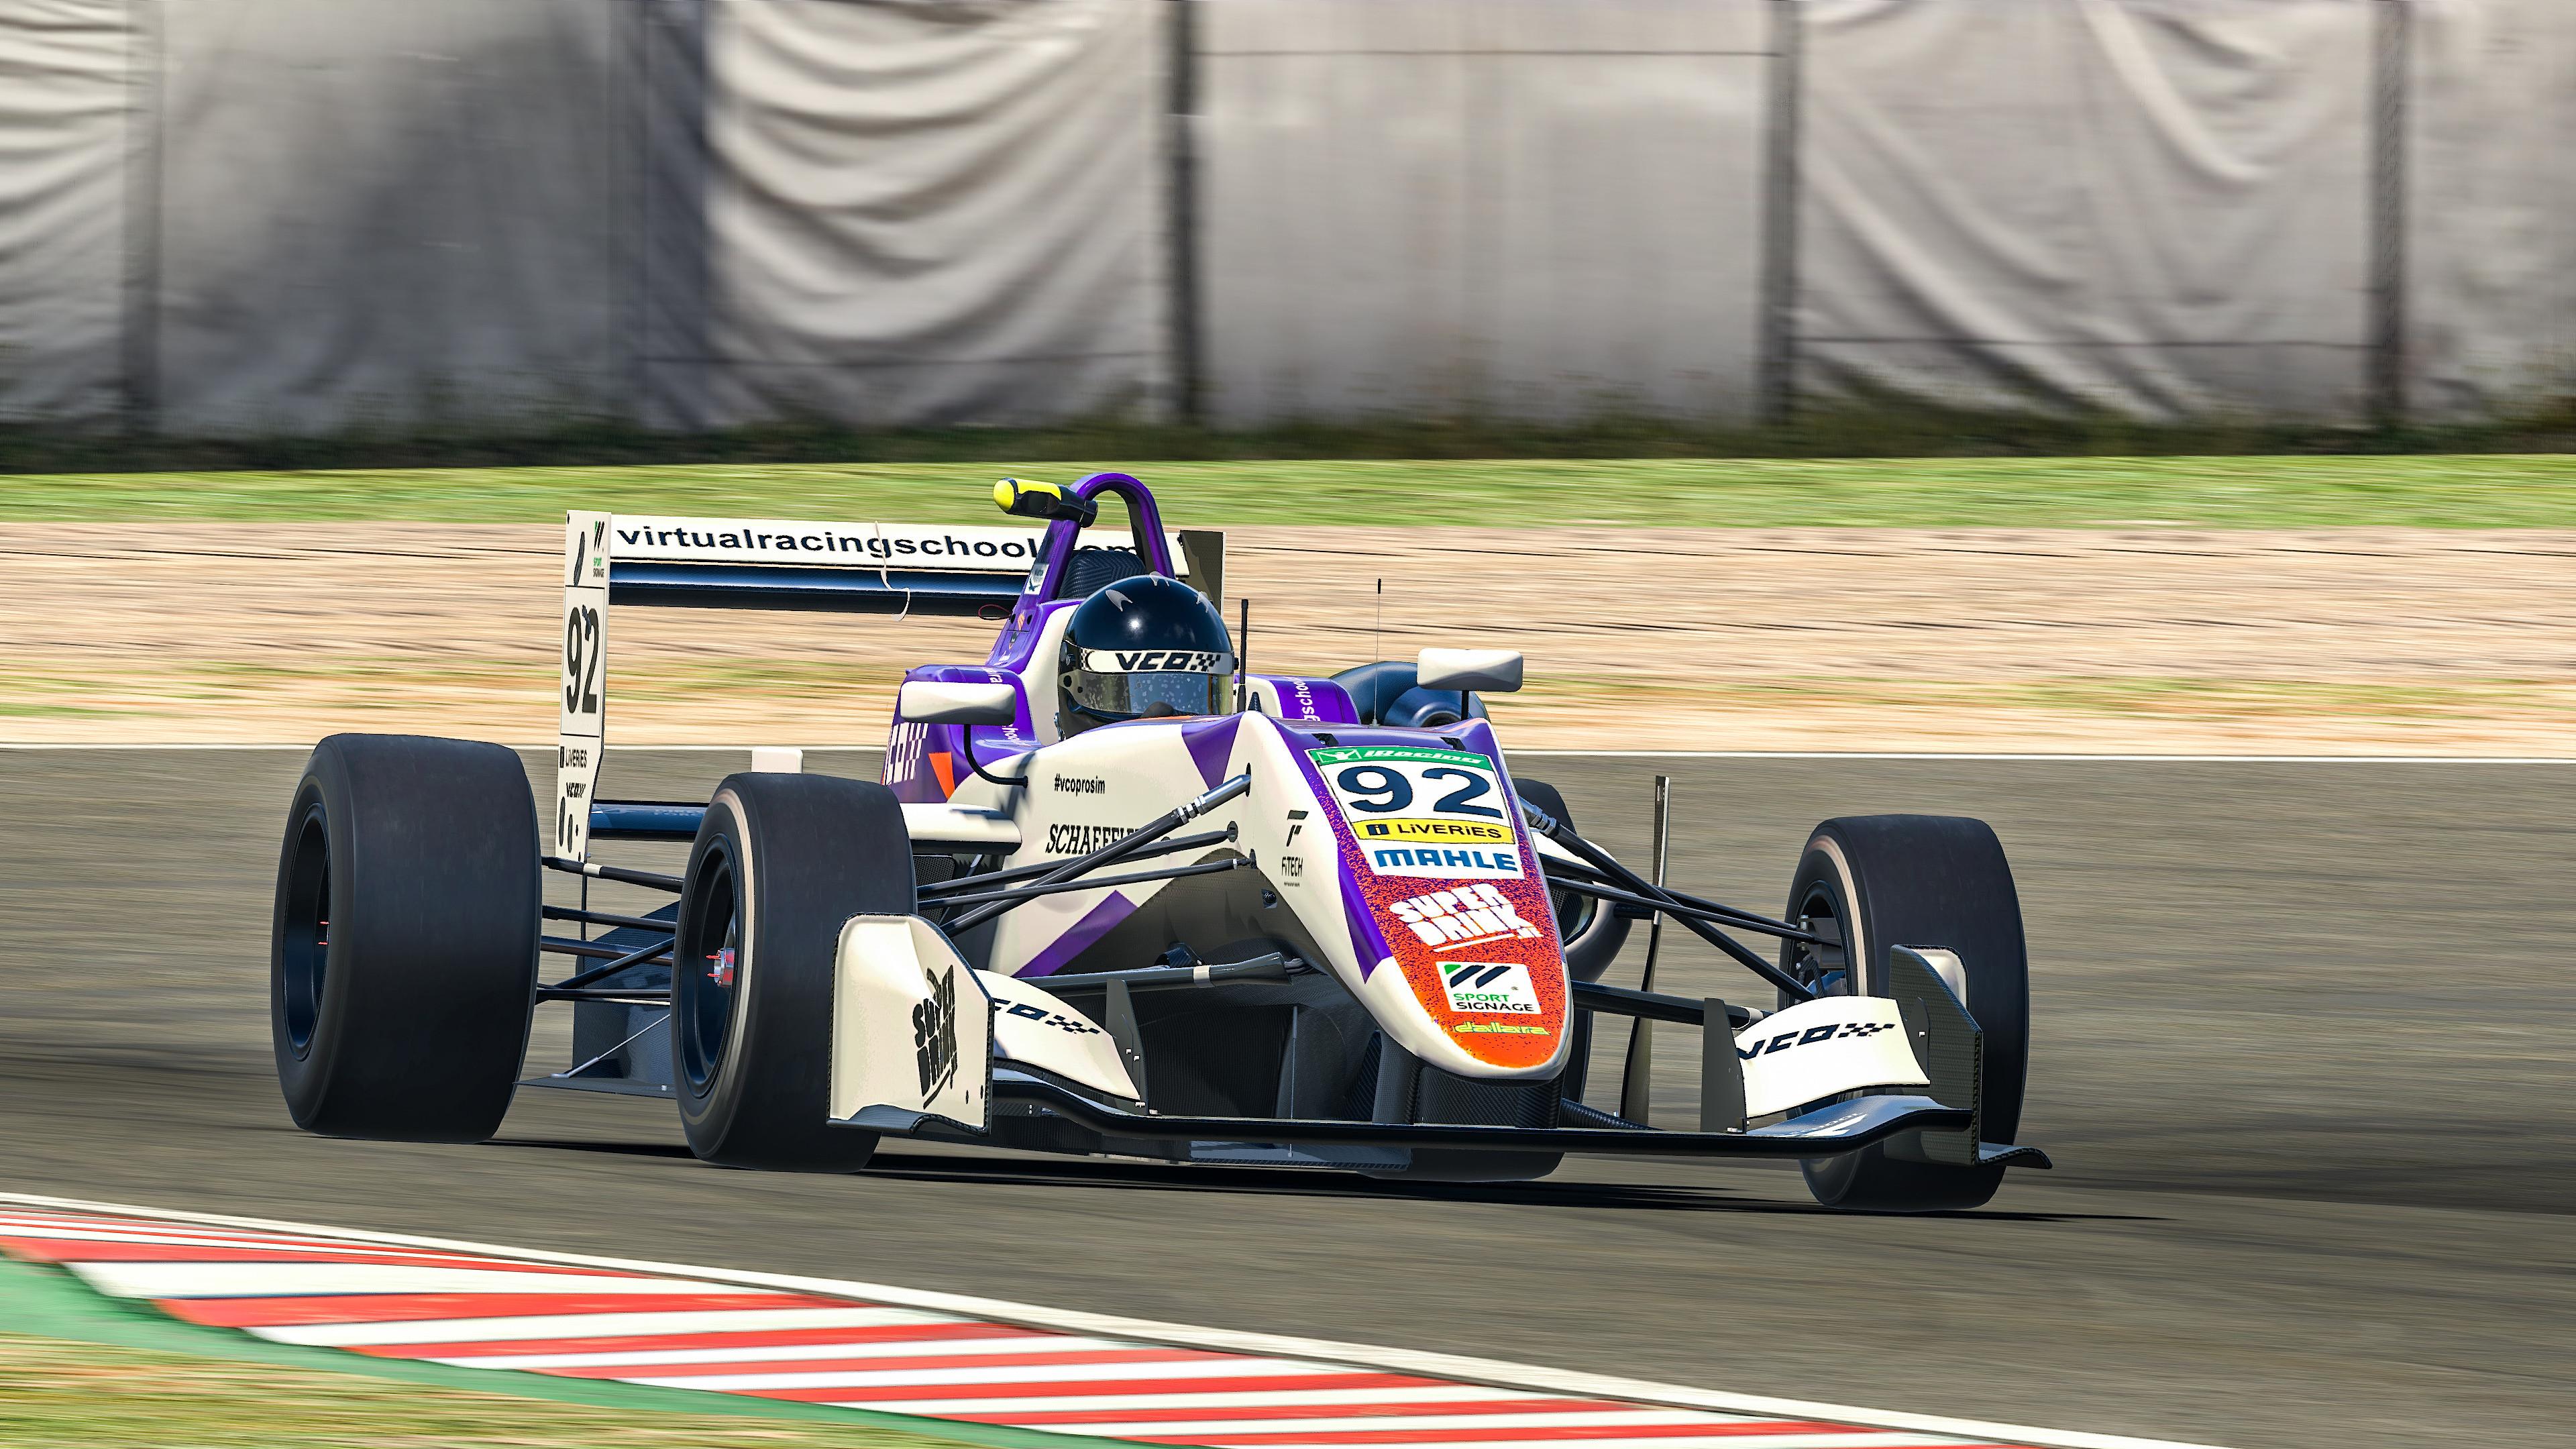 Coanda Simsport liveried Formula Three car driving at speed.